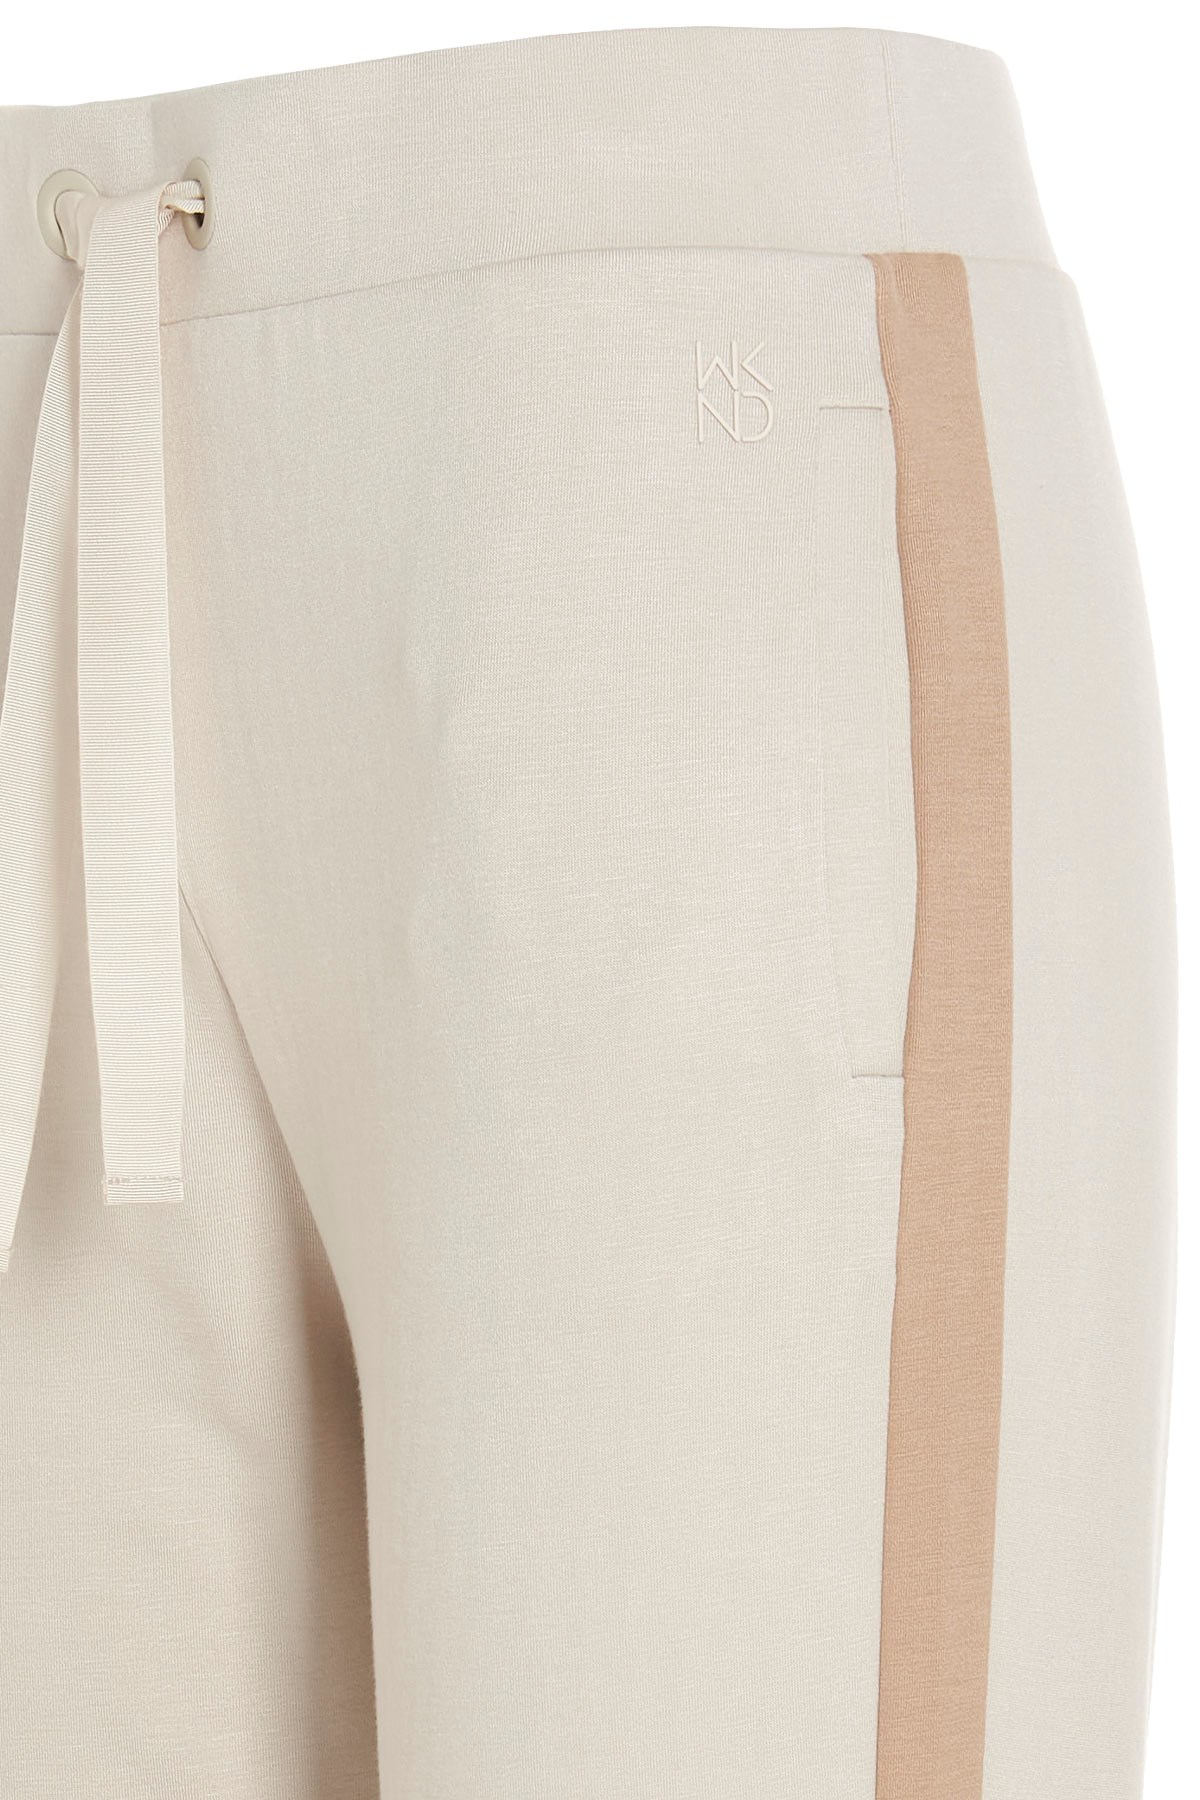 pantaloni jogger in jersey MAX MARA WEEKEND | 9 | 57860319600003